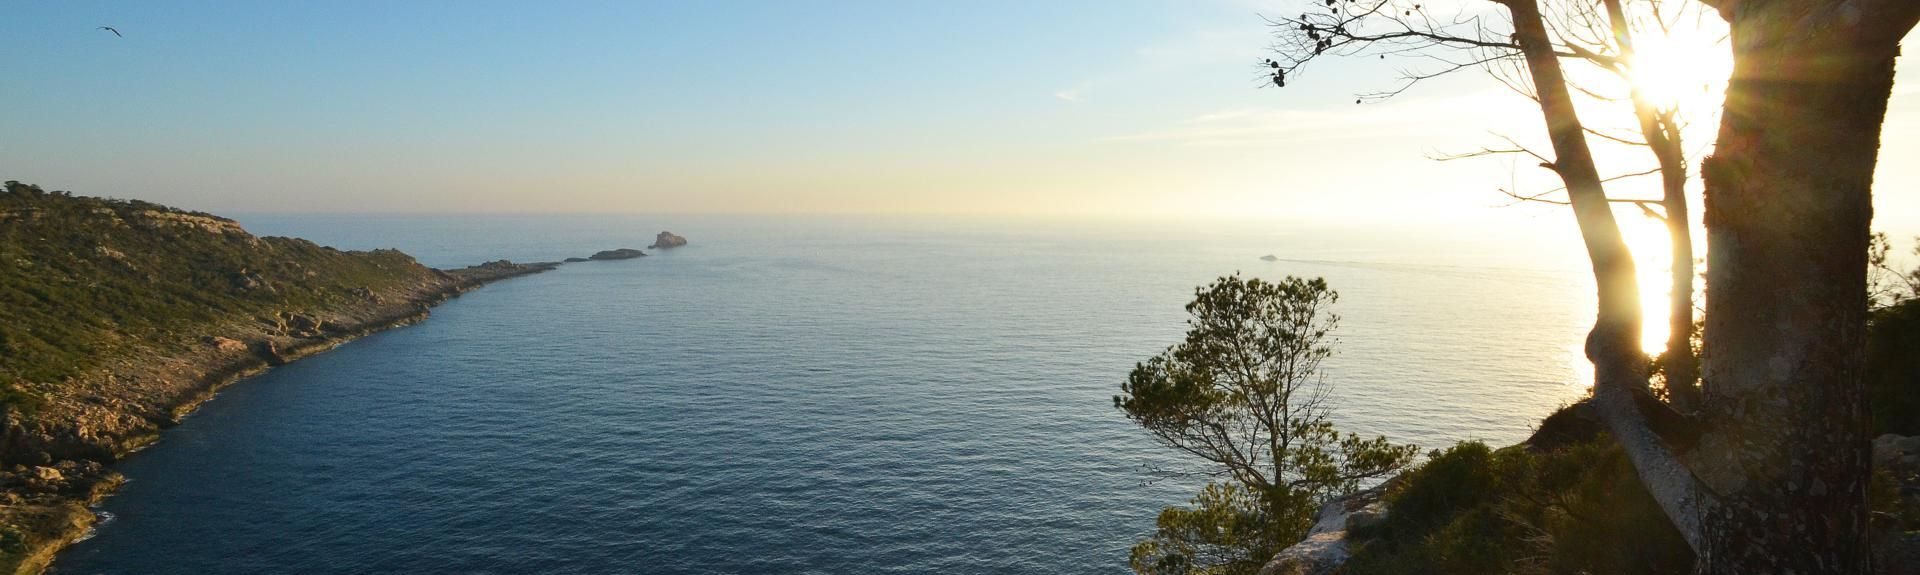 Palma Novan ranta, Palmanova, Baleaarit, Espanja